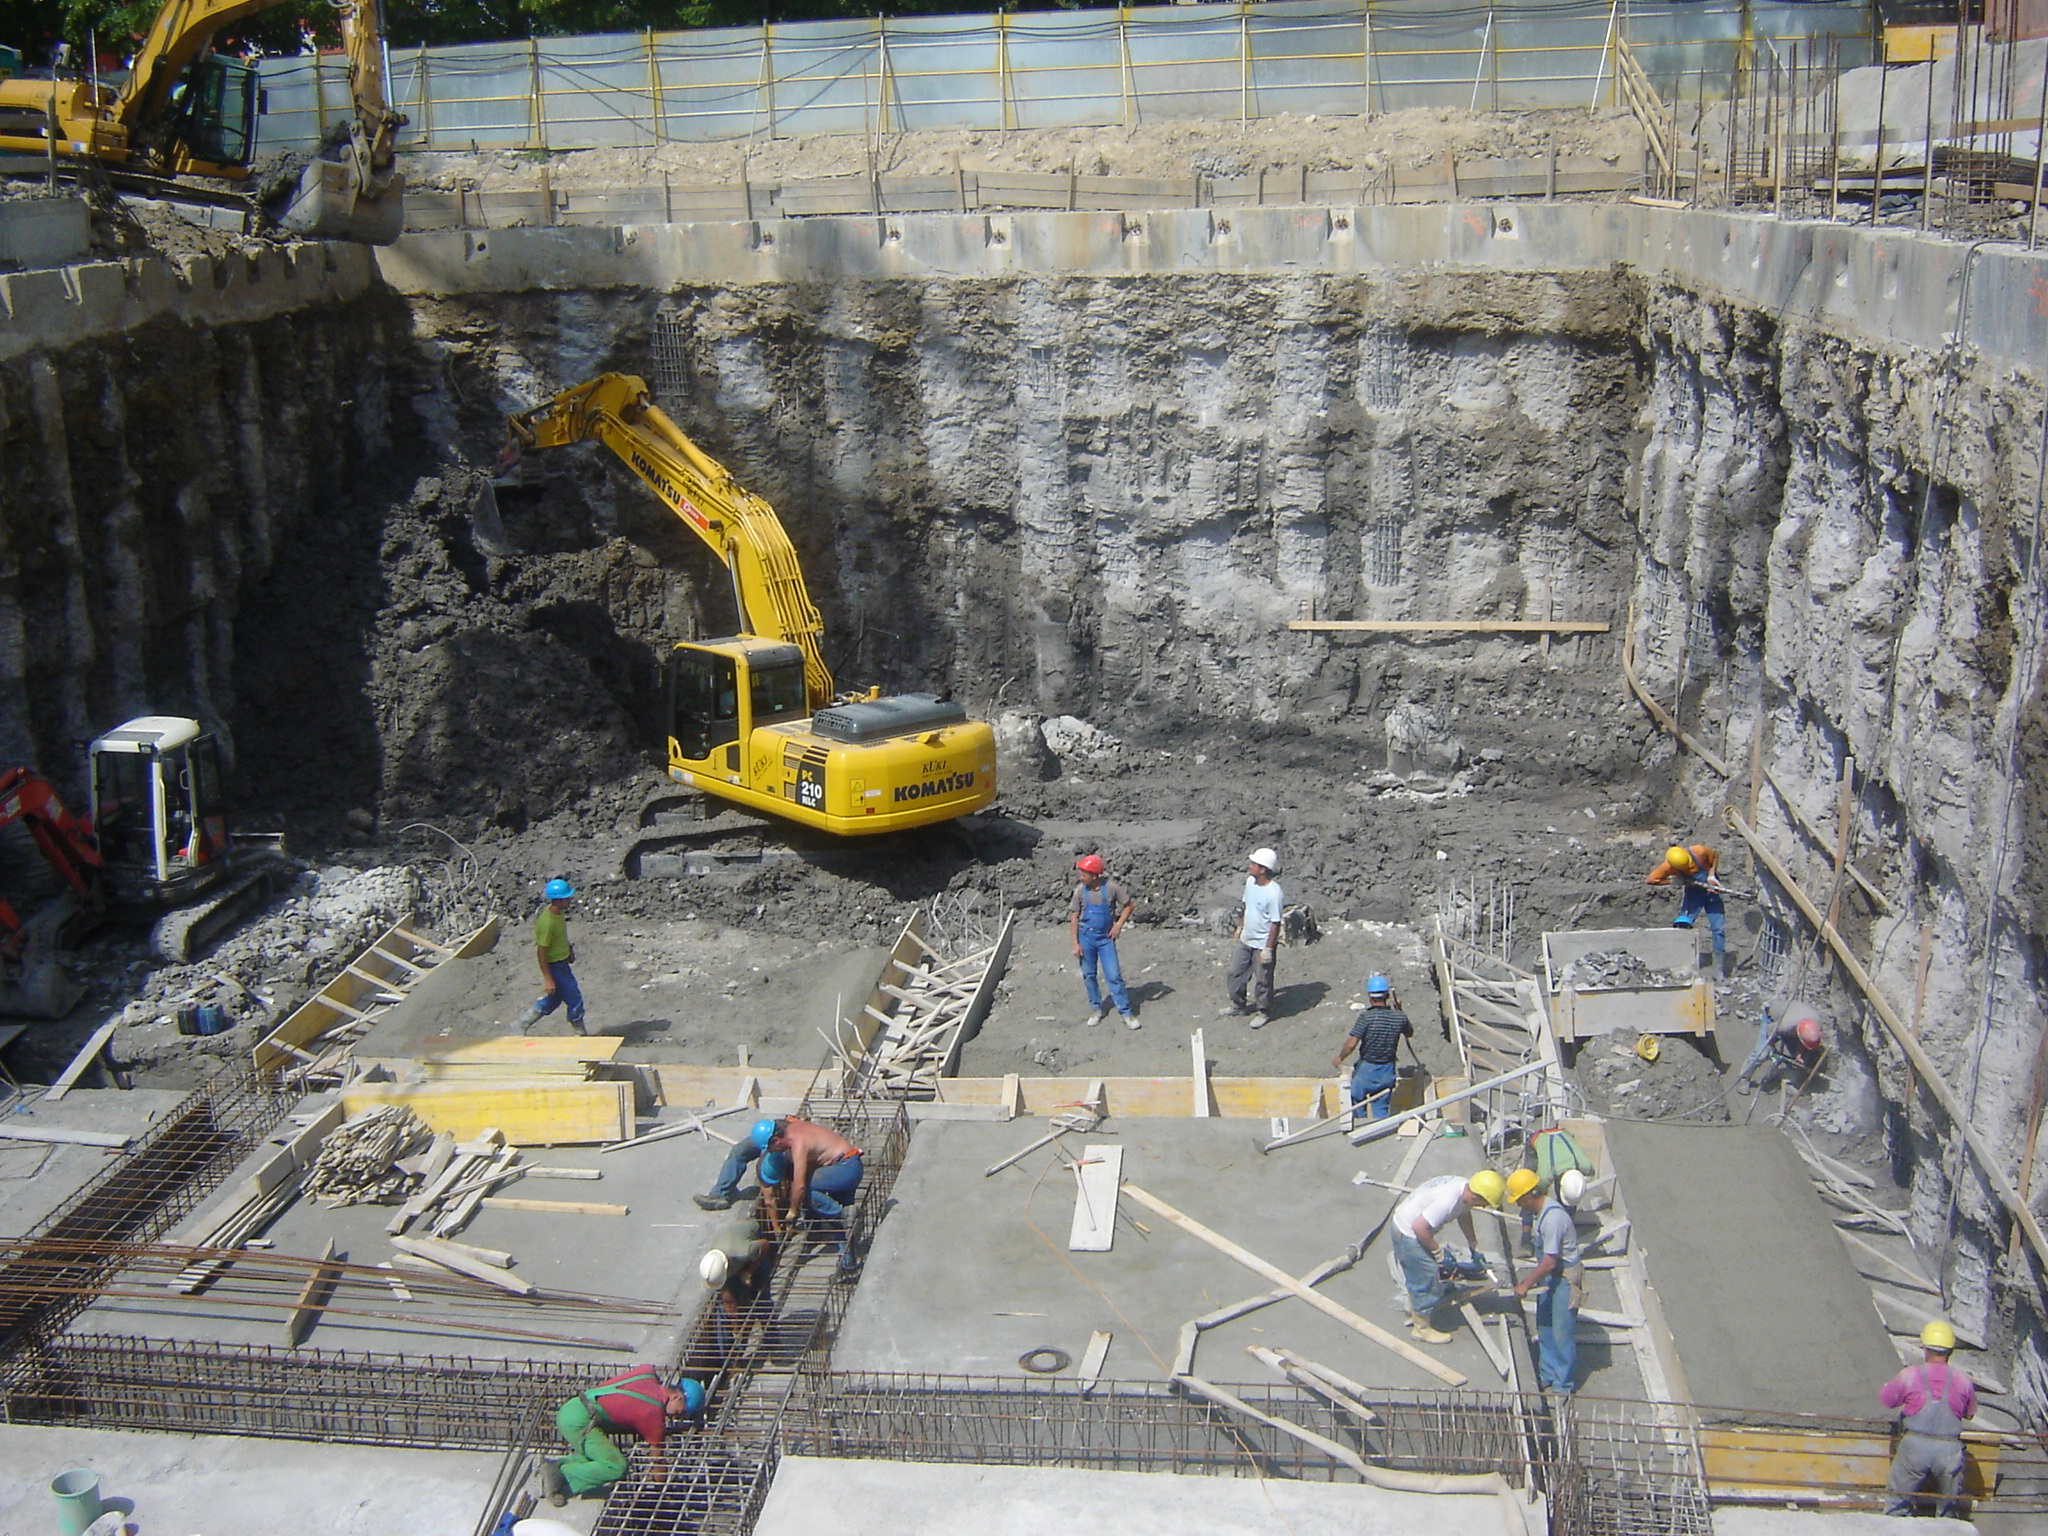 Building site - Rapir